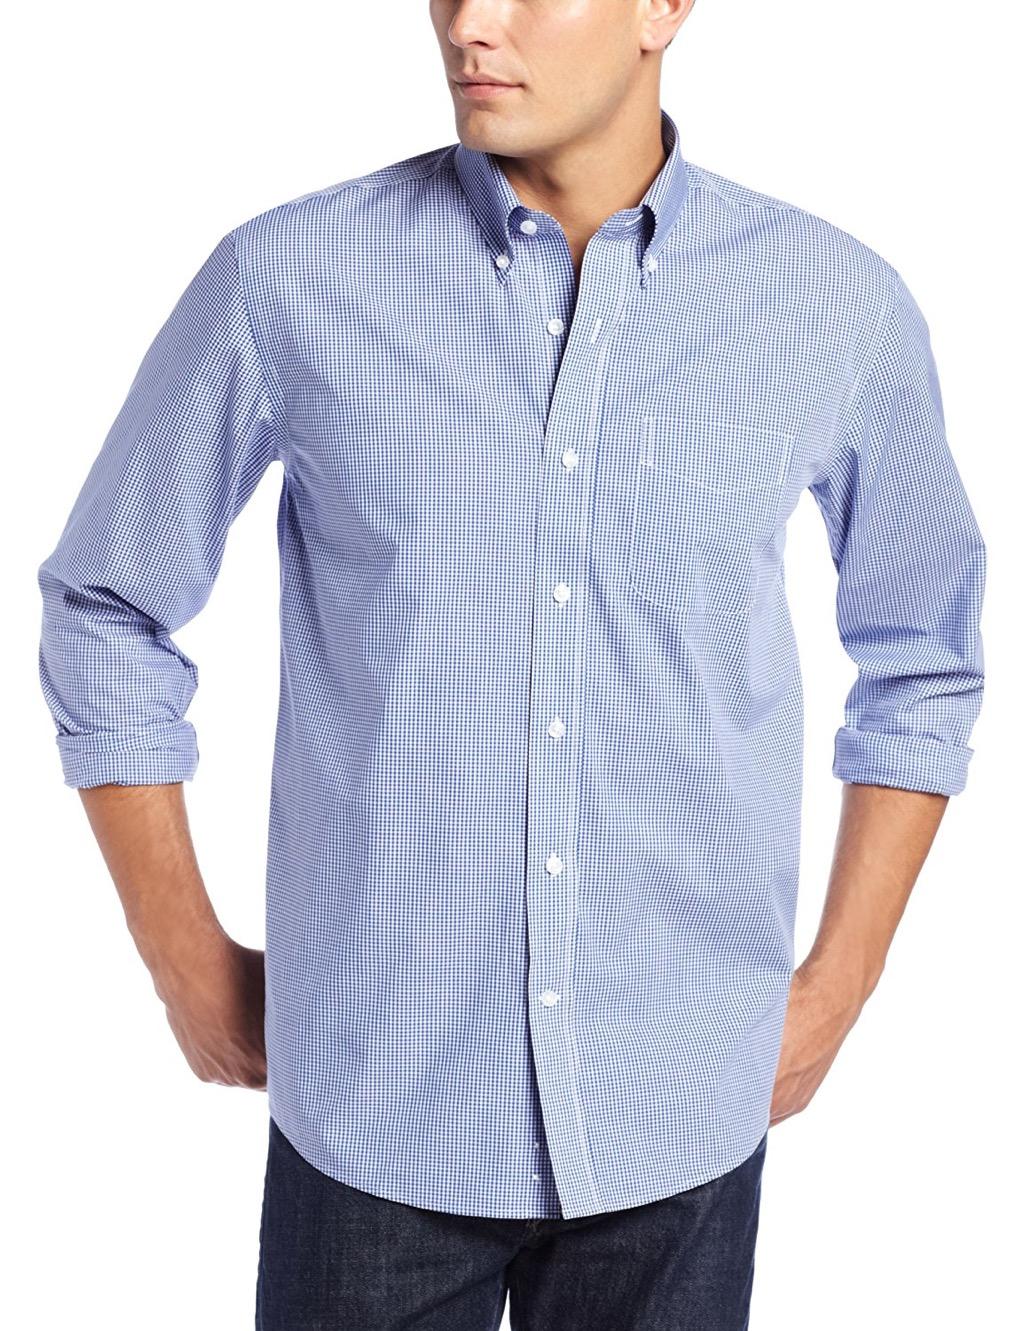 cutter and buck untucked shirt